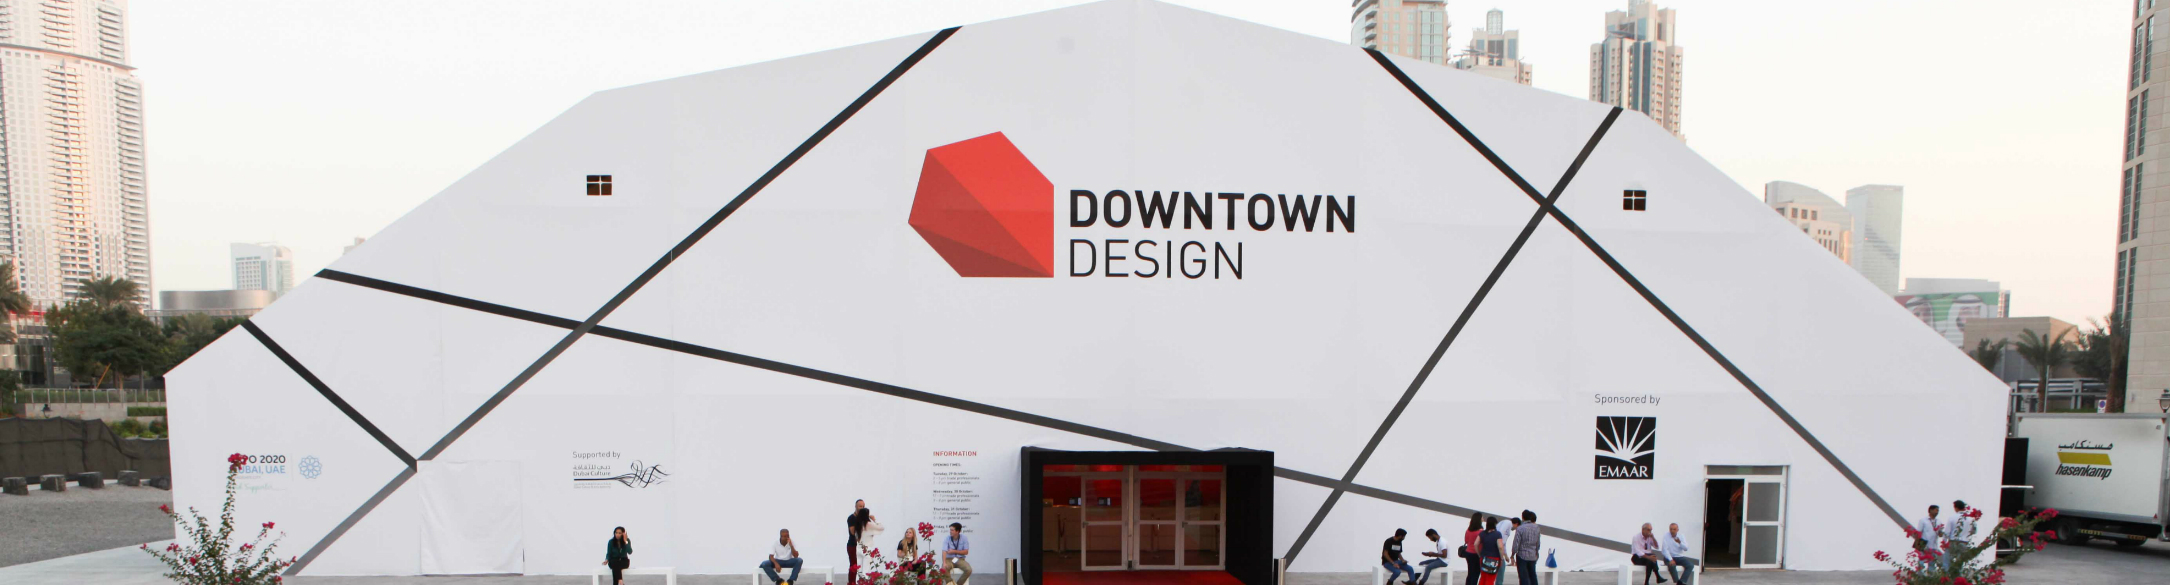 Design Exhibitions 2014 exhibitions & events | design & lifestyle blog